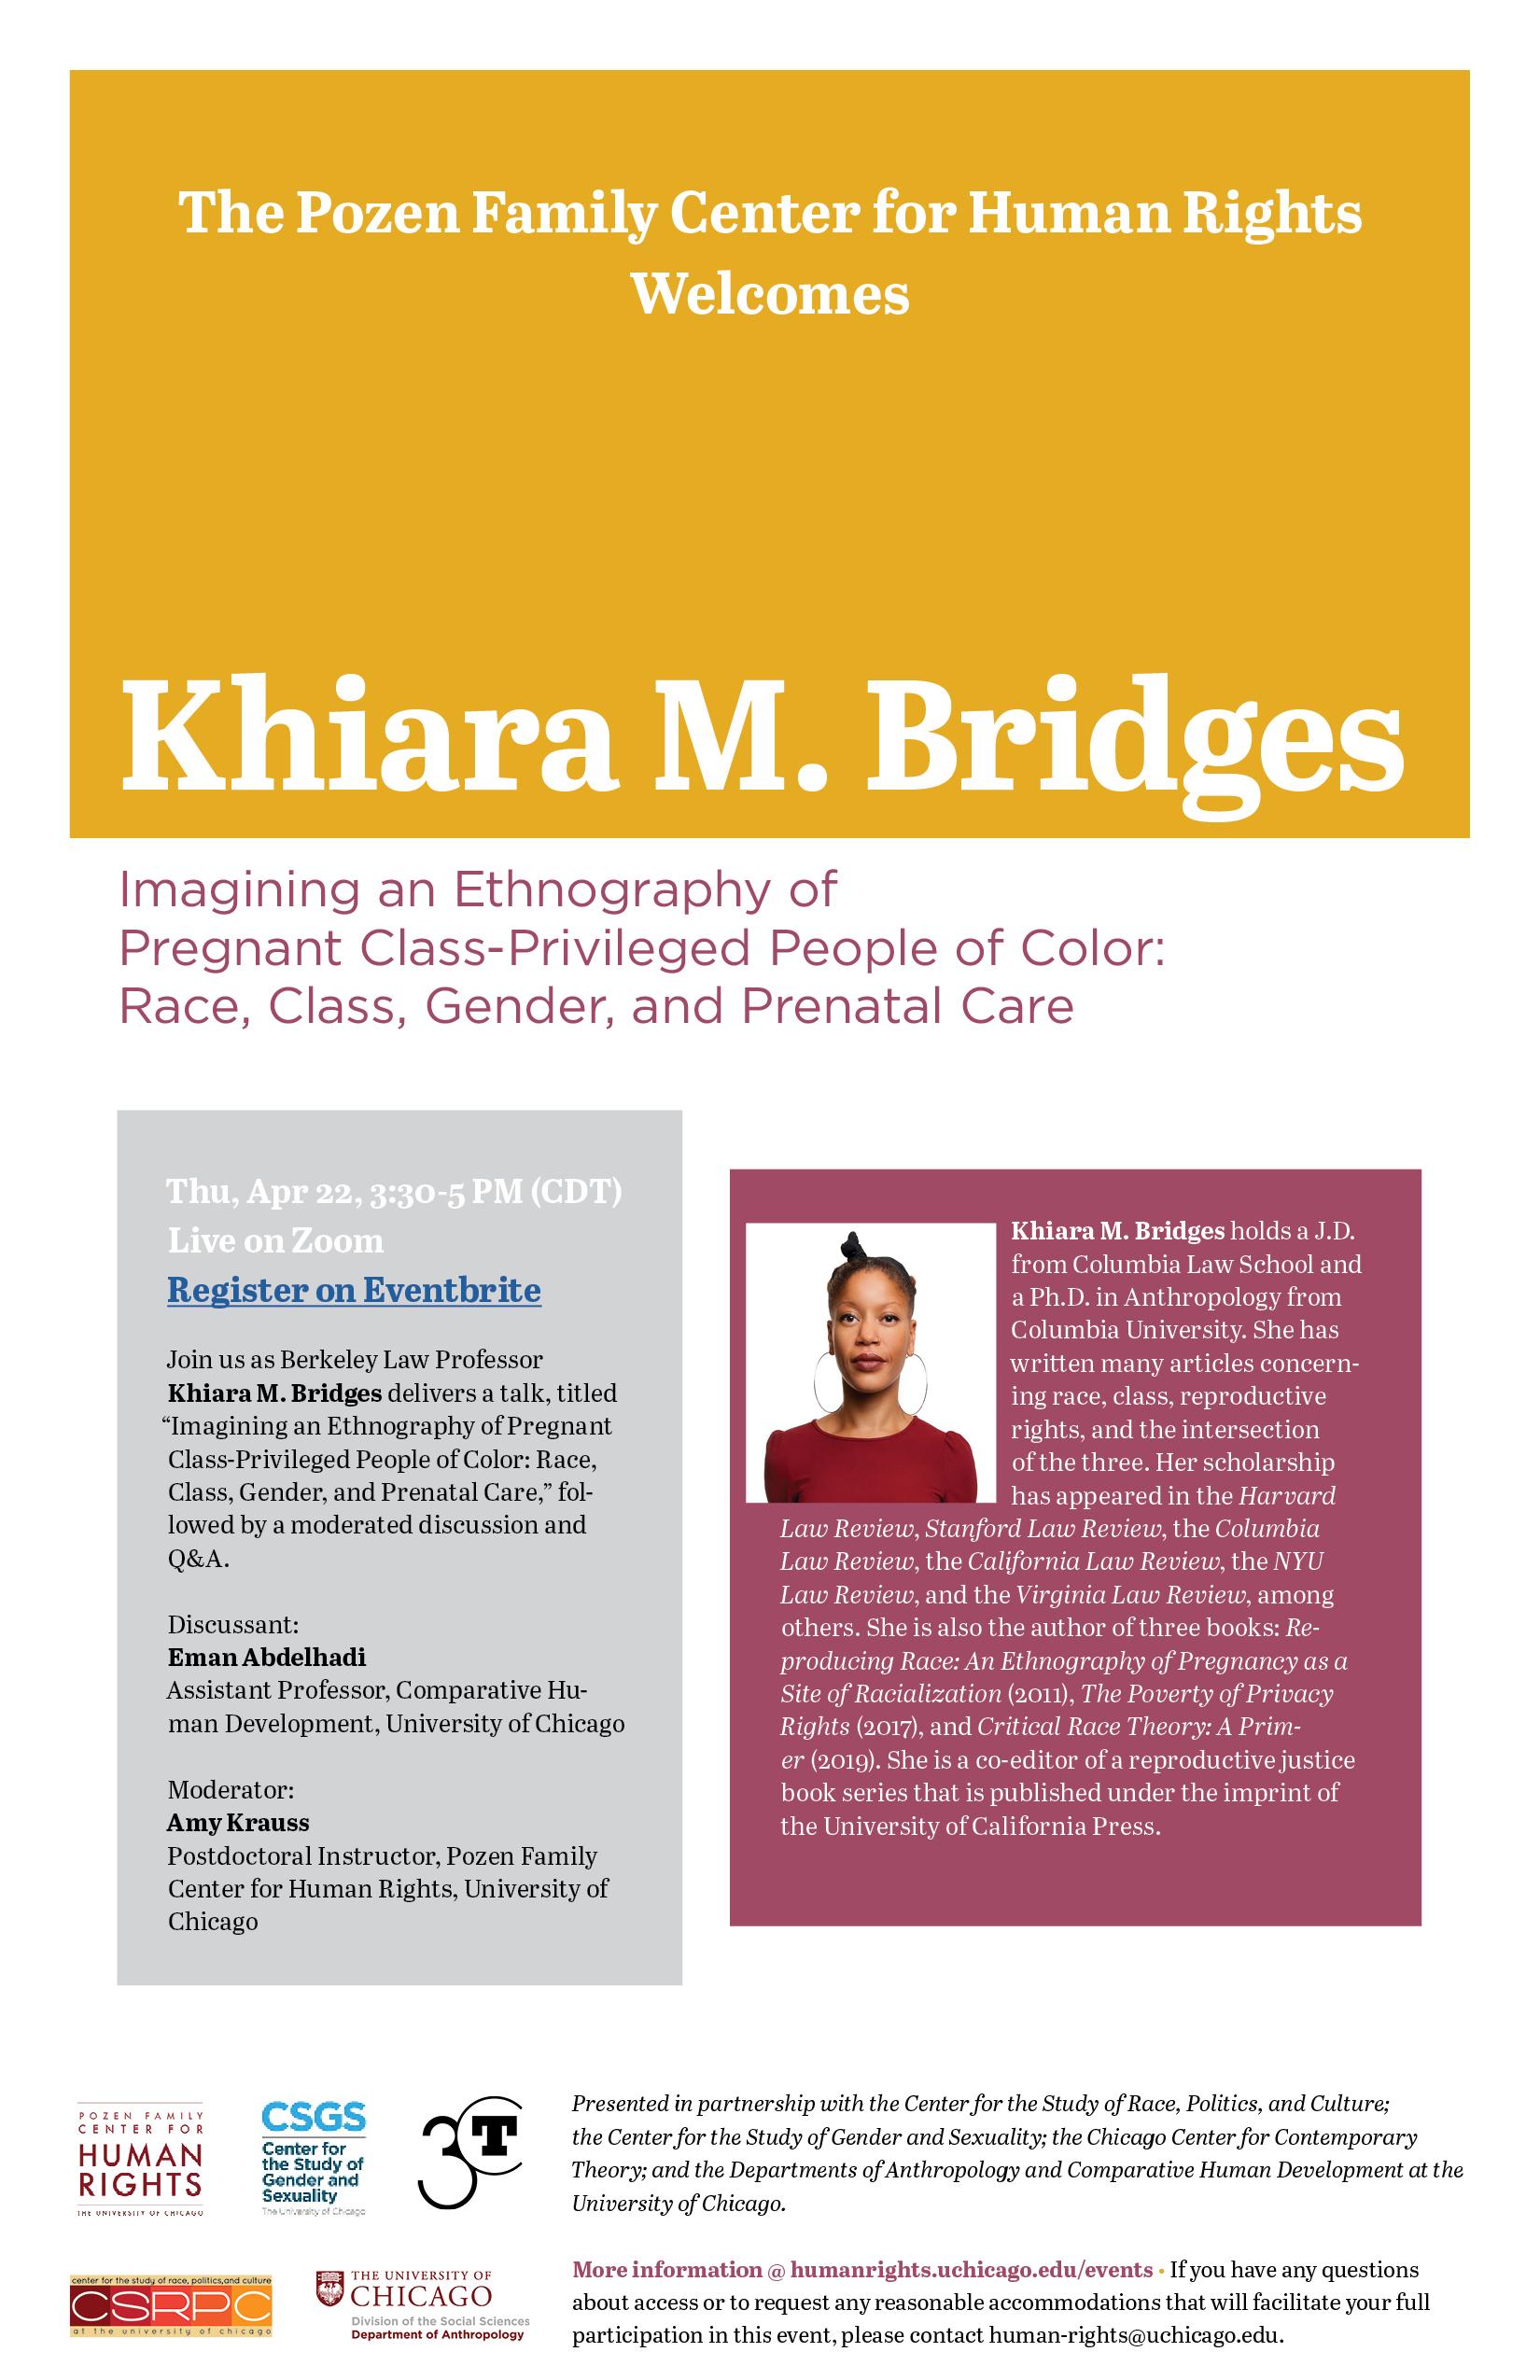 flyer for Khiara M. Bridges event